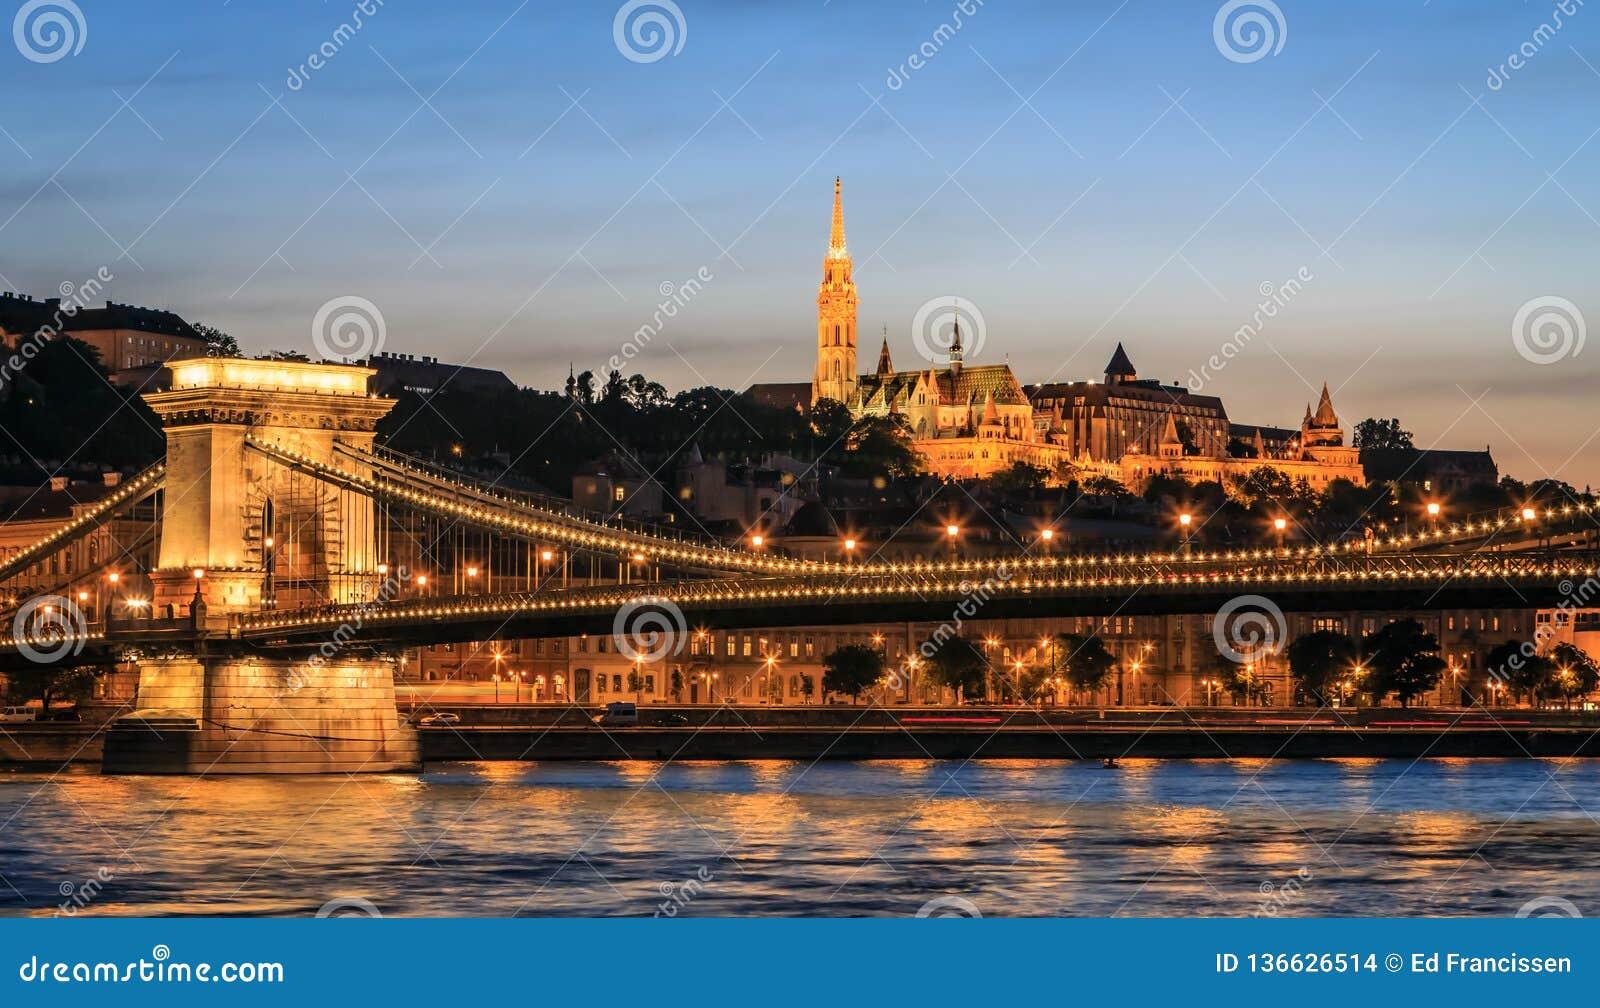 Buda Castle and the Danube.